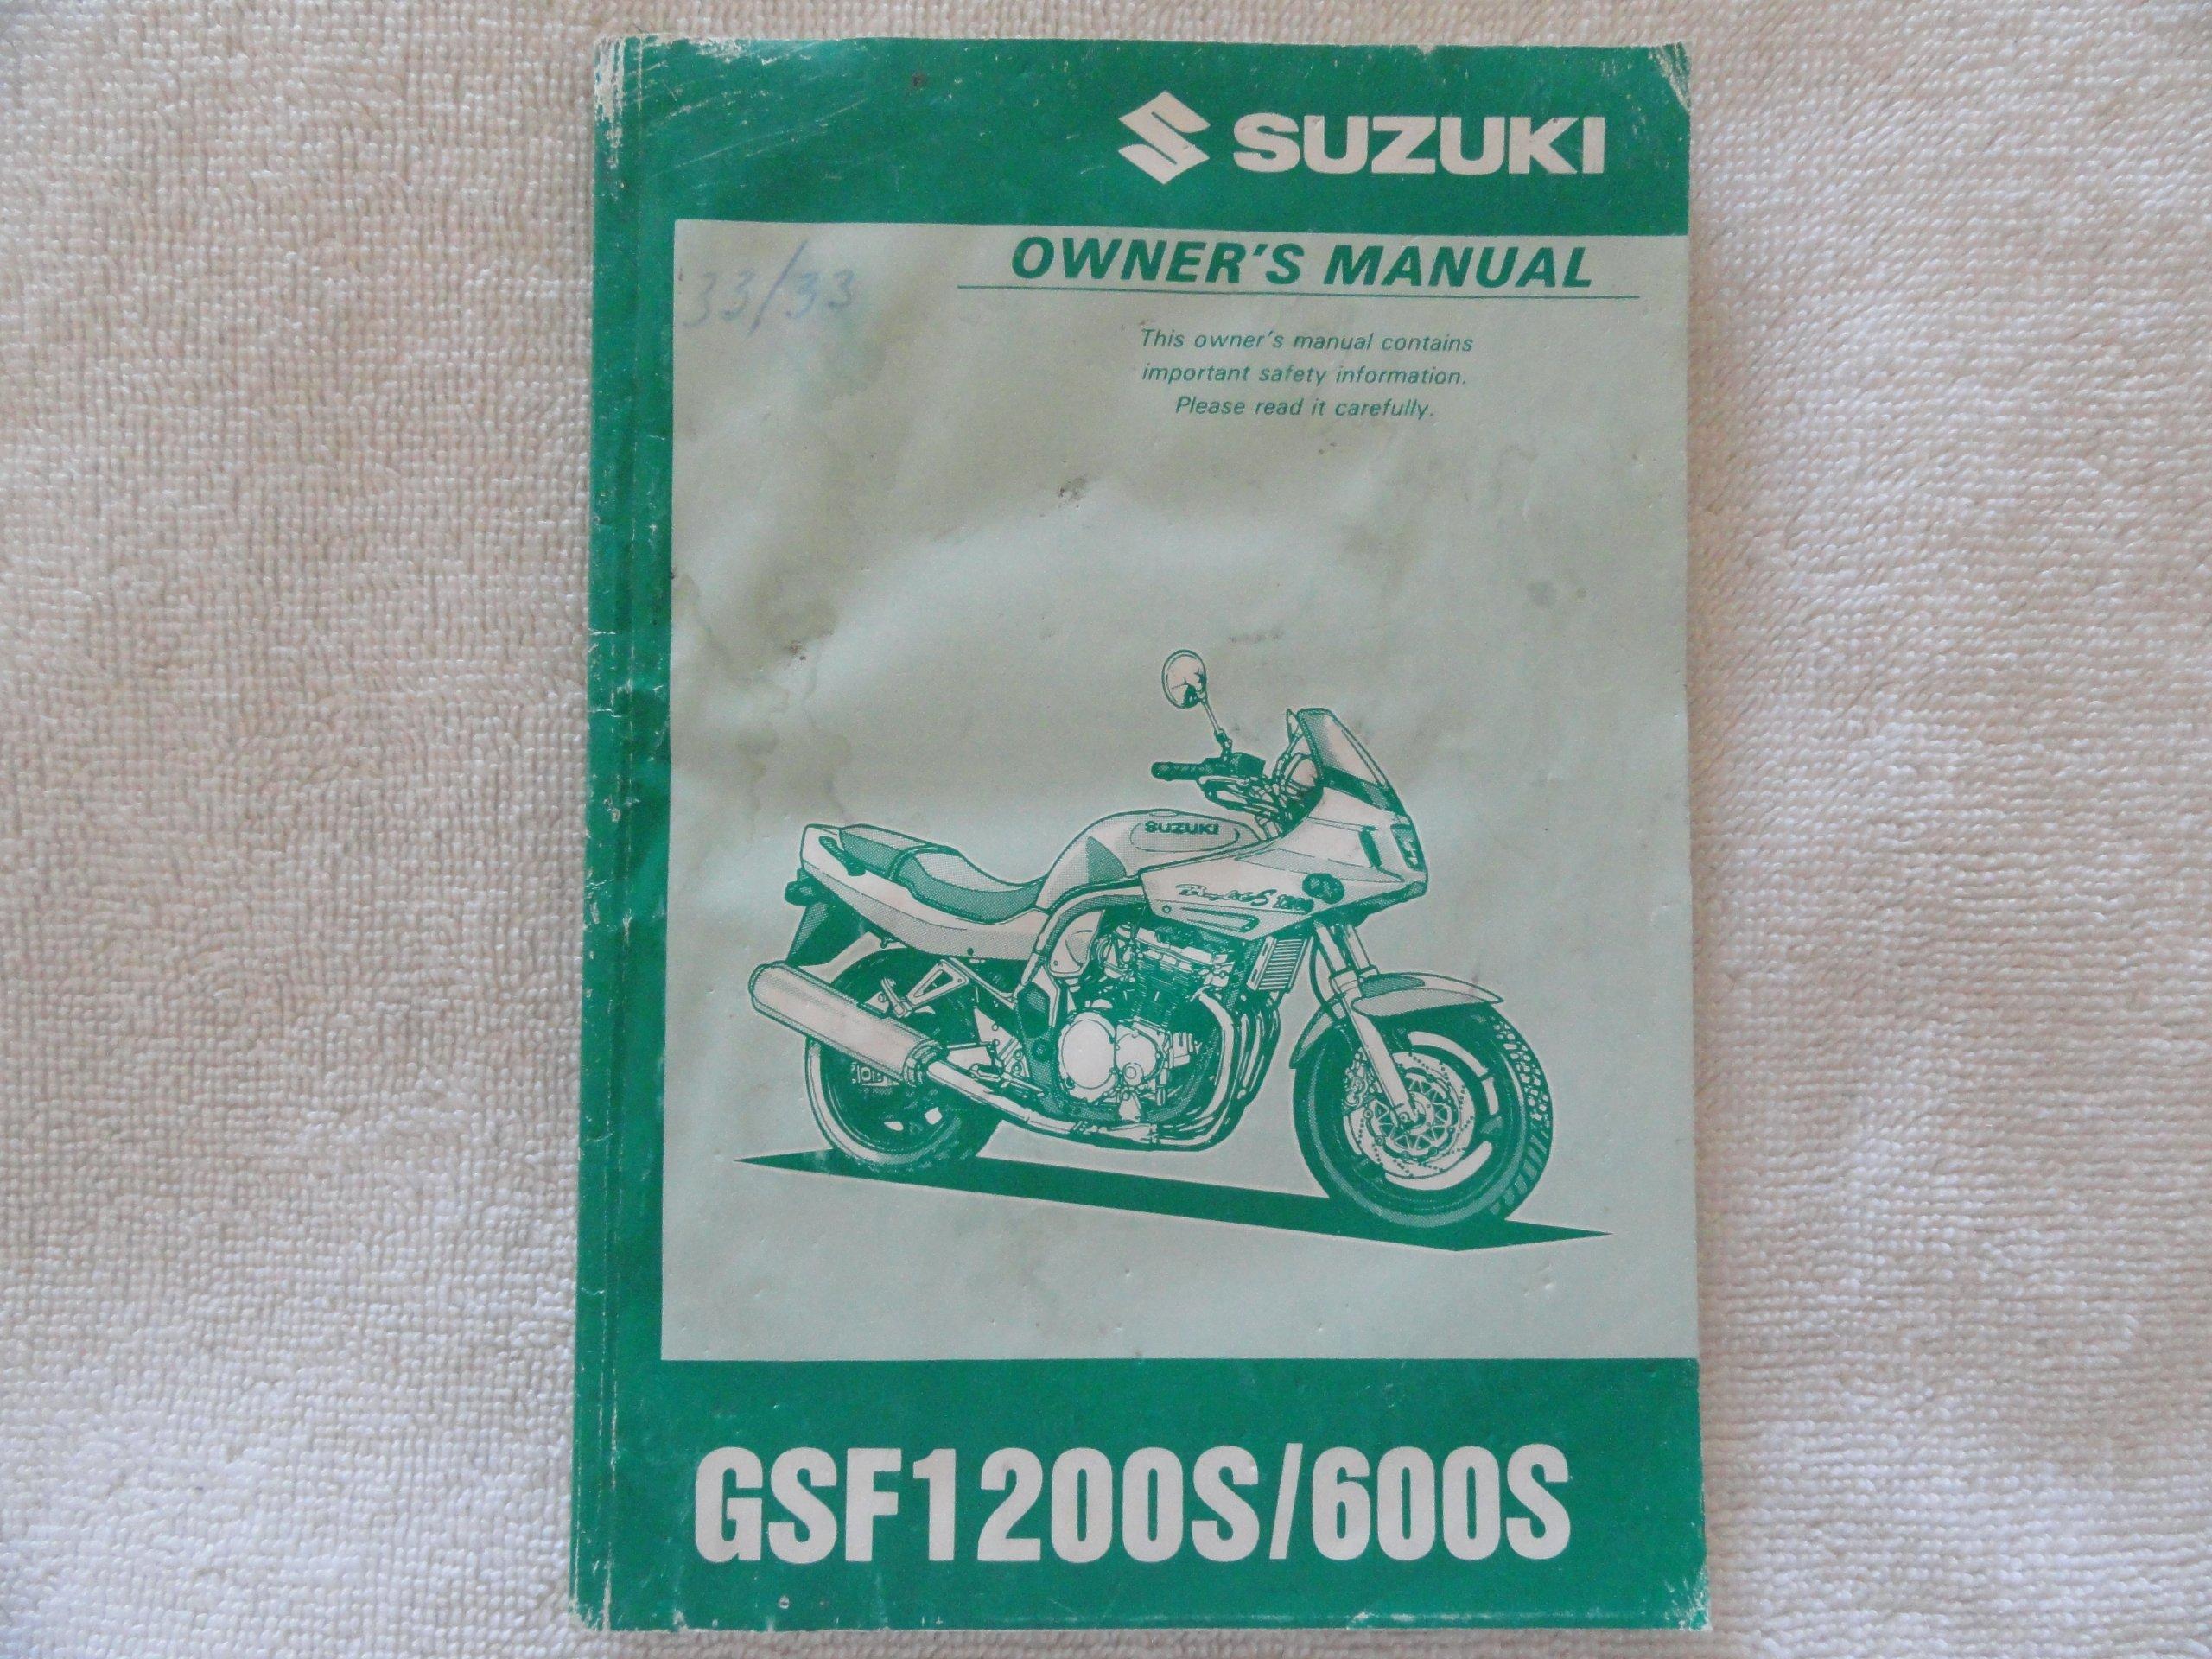 1996 1997 Suzuki GSF1200 Owners Manual GSF 1200 600 S: Suzuki: Amazon.com:  Books